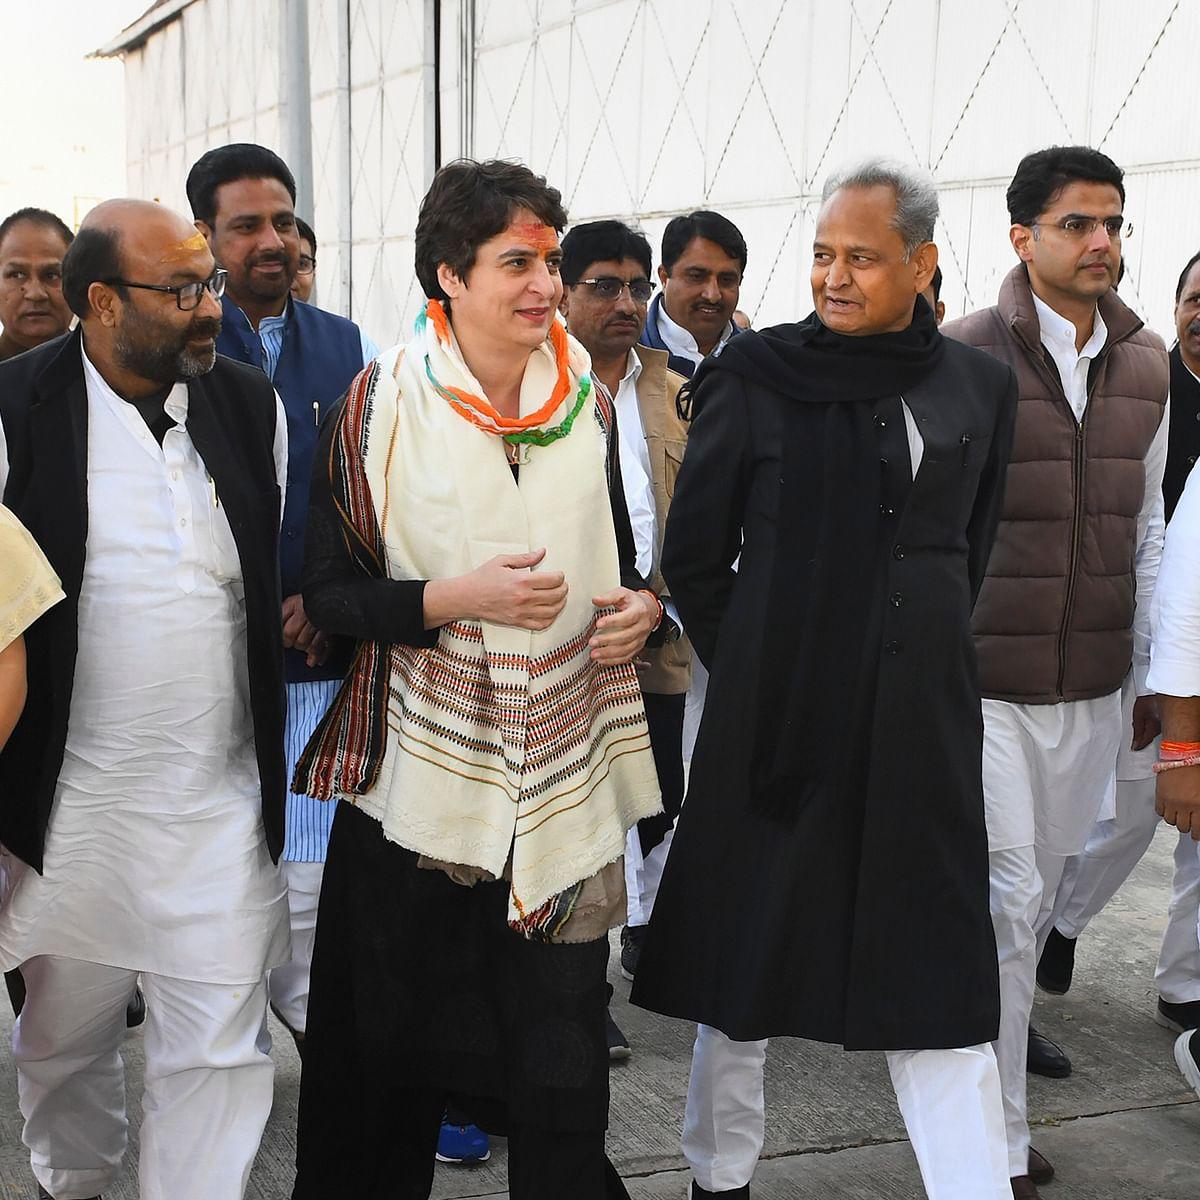 Priyanka Gandhi meets anti-CAA activists in Varanasi, says govt acting against Constitution